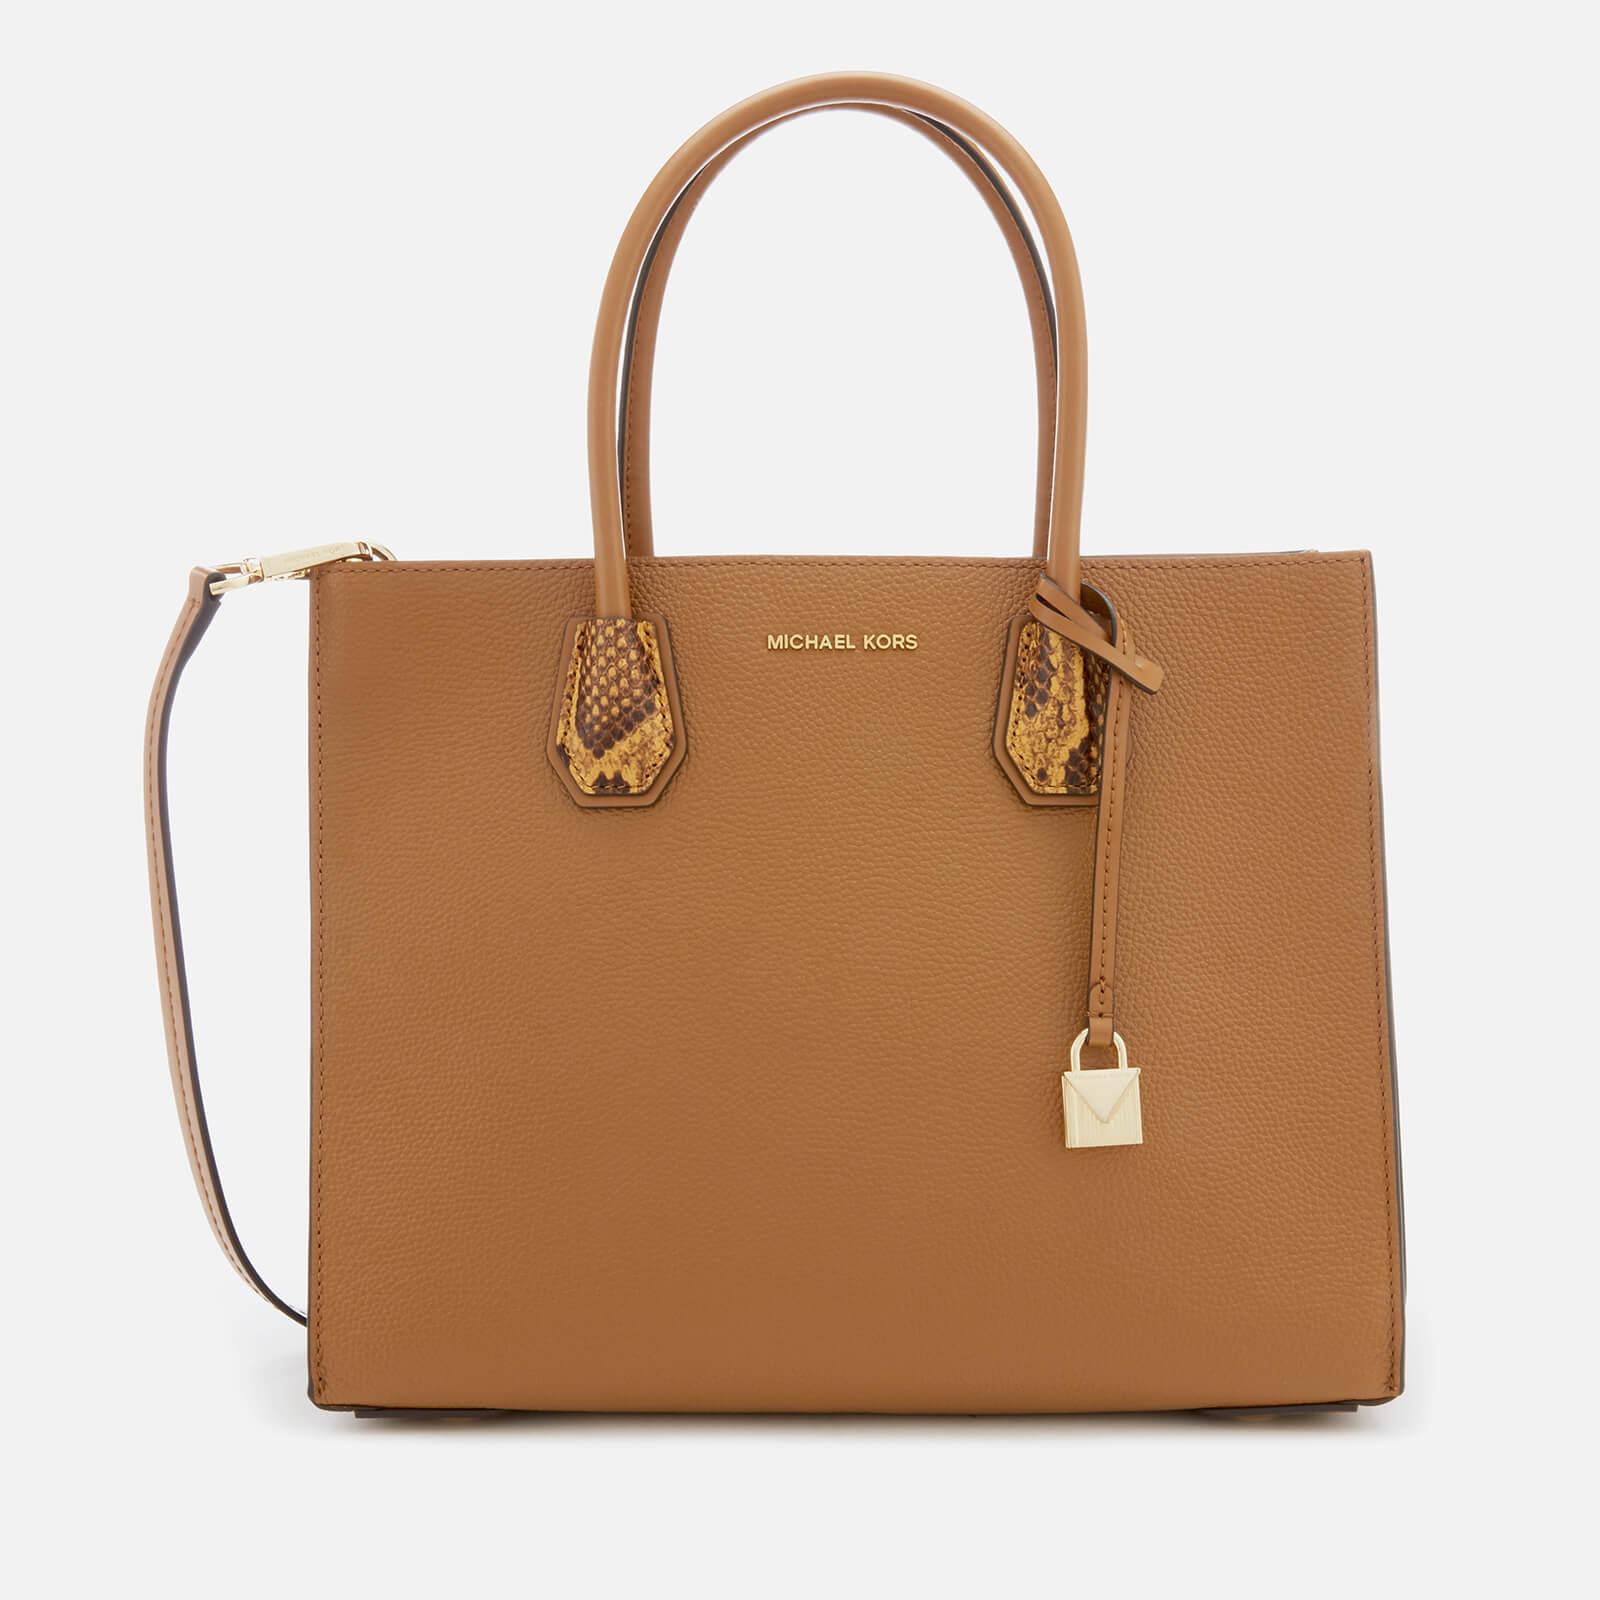 0c9277c41279 MICHAEL MICHAEL KORS Women's Mercer Large Convertible Tote Bag - Acorn -  Free UK Delivery over £50